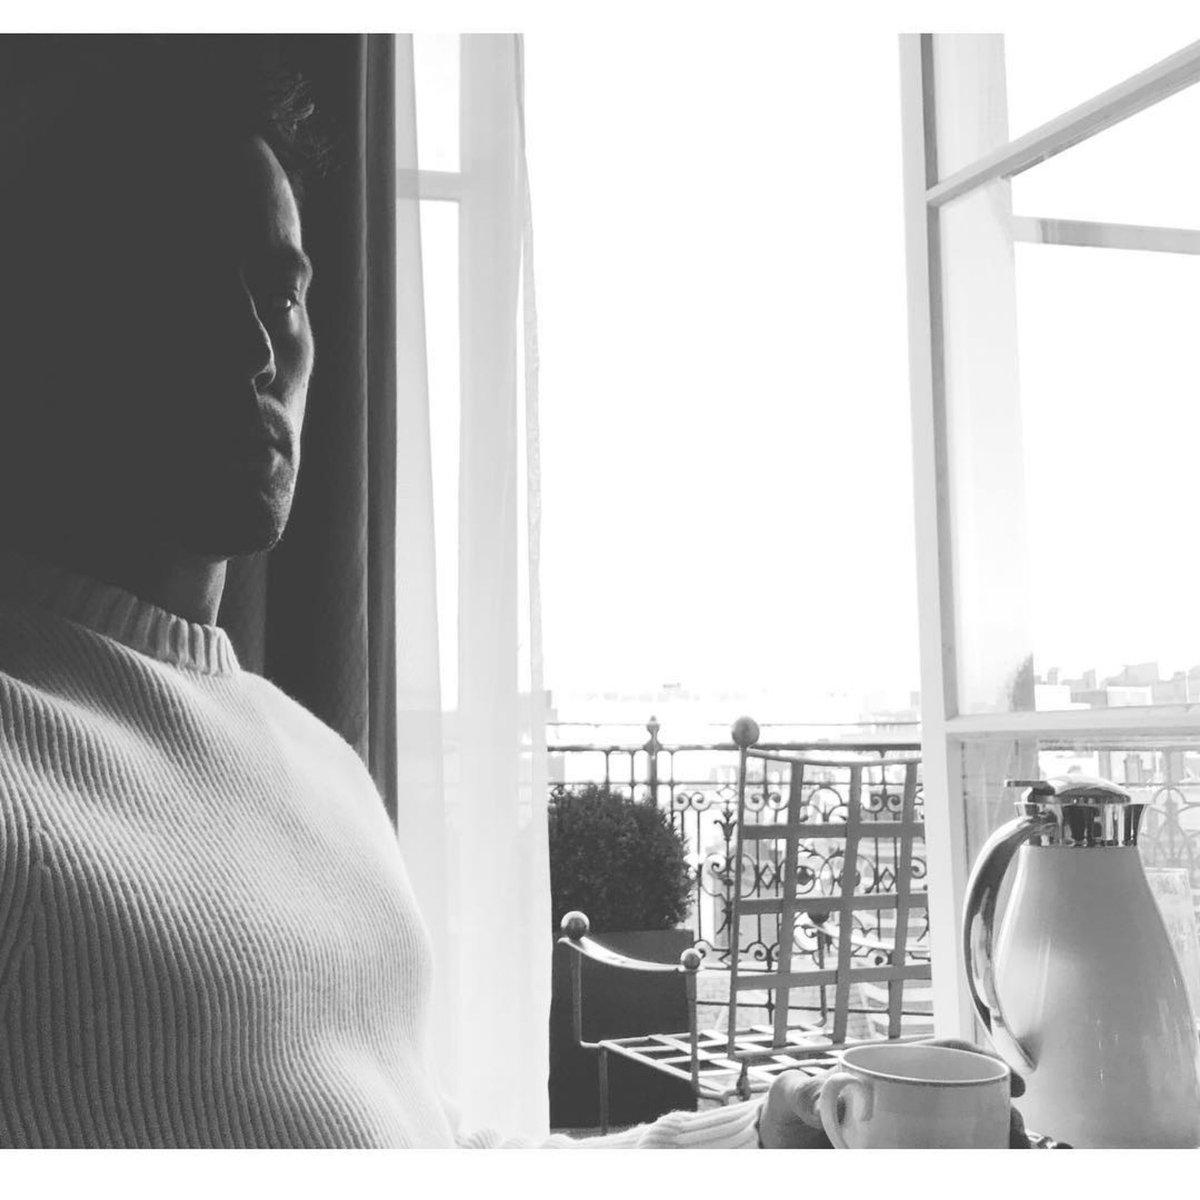 Good morning! Breakfast in London windows wide open. Feeling the love. So sending love back to all. https://t.co/iC1cfwrzrd